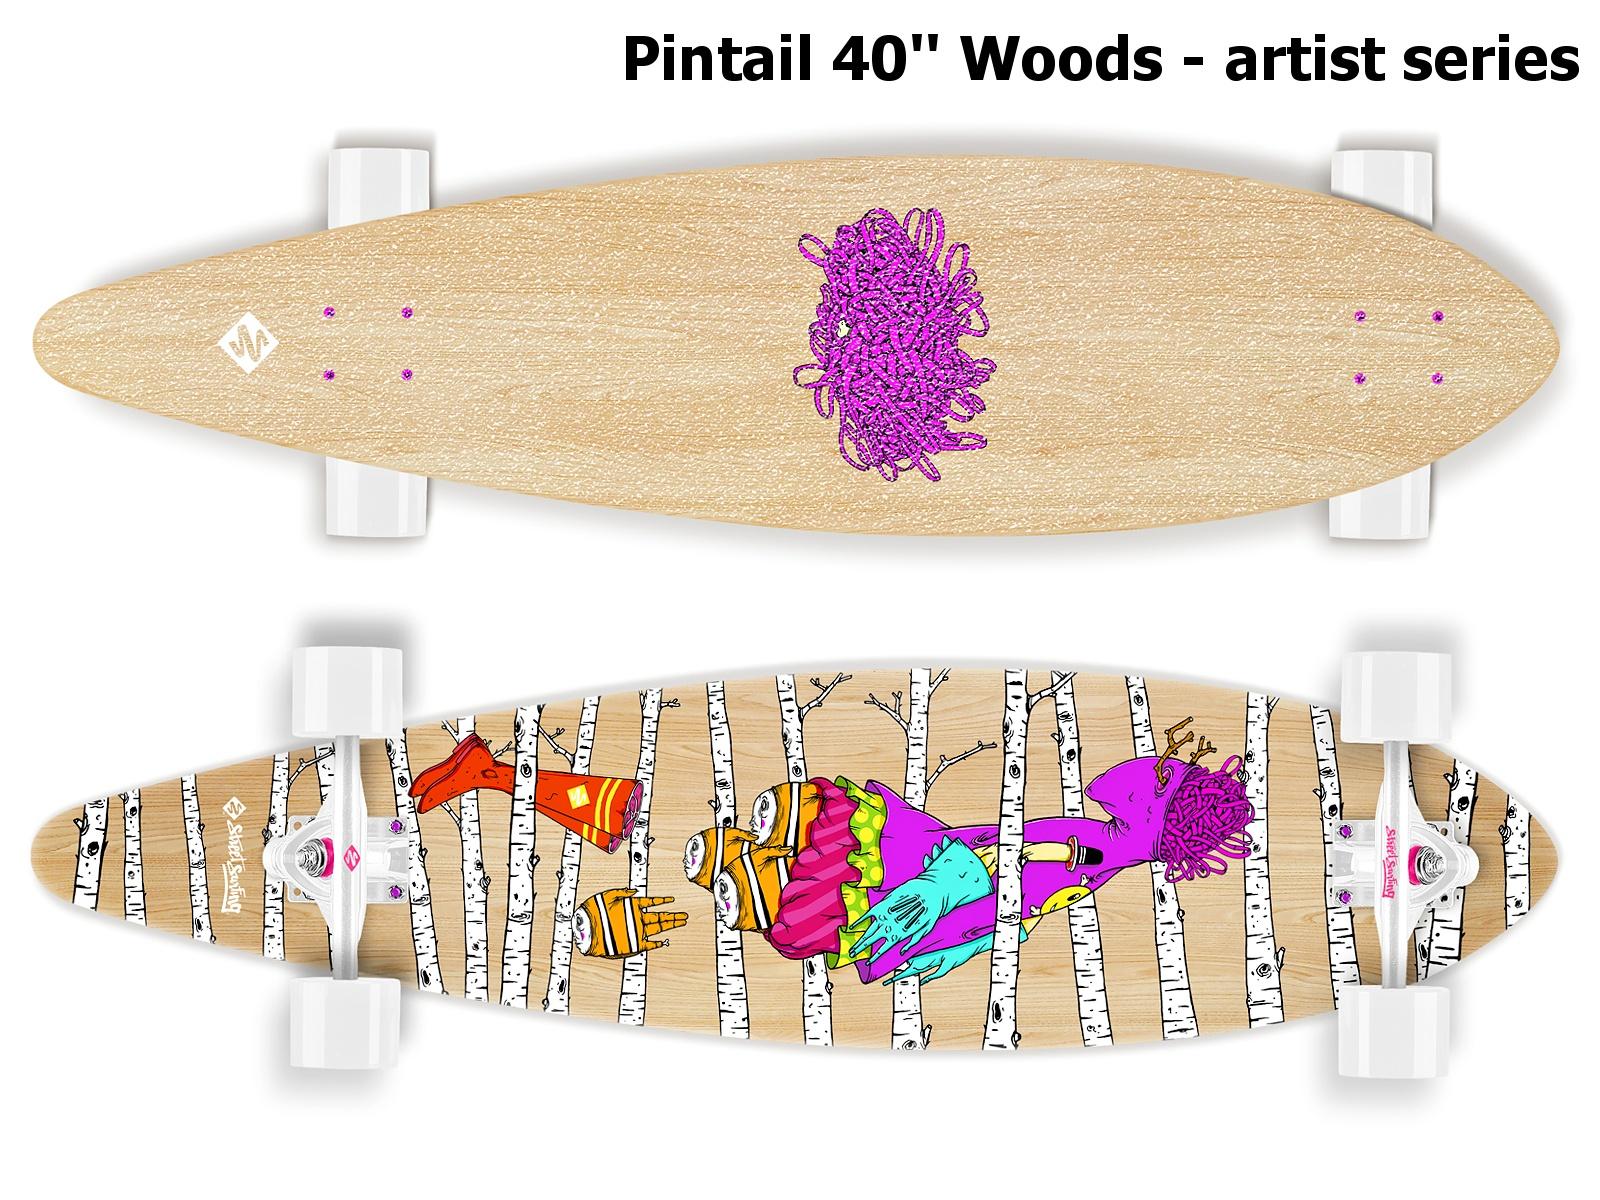 Longboard STREET SURFING Pintail 40 Woods